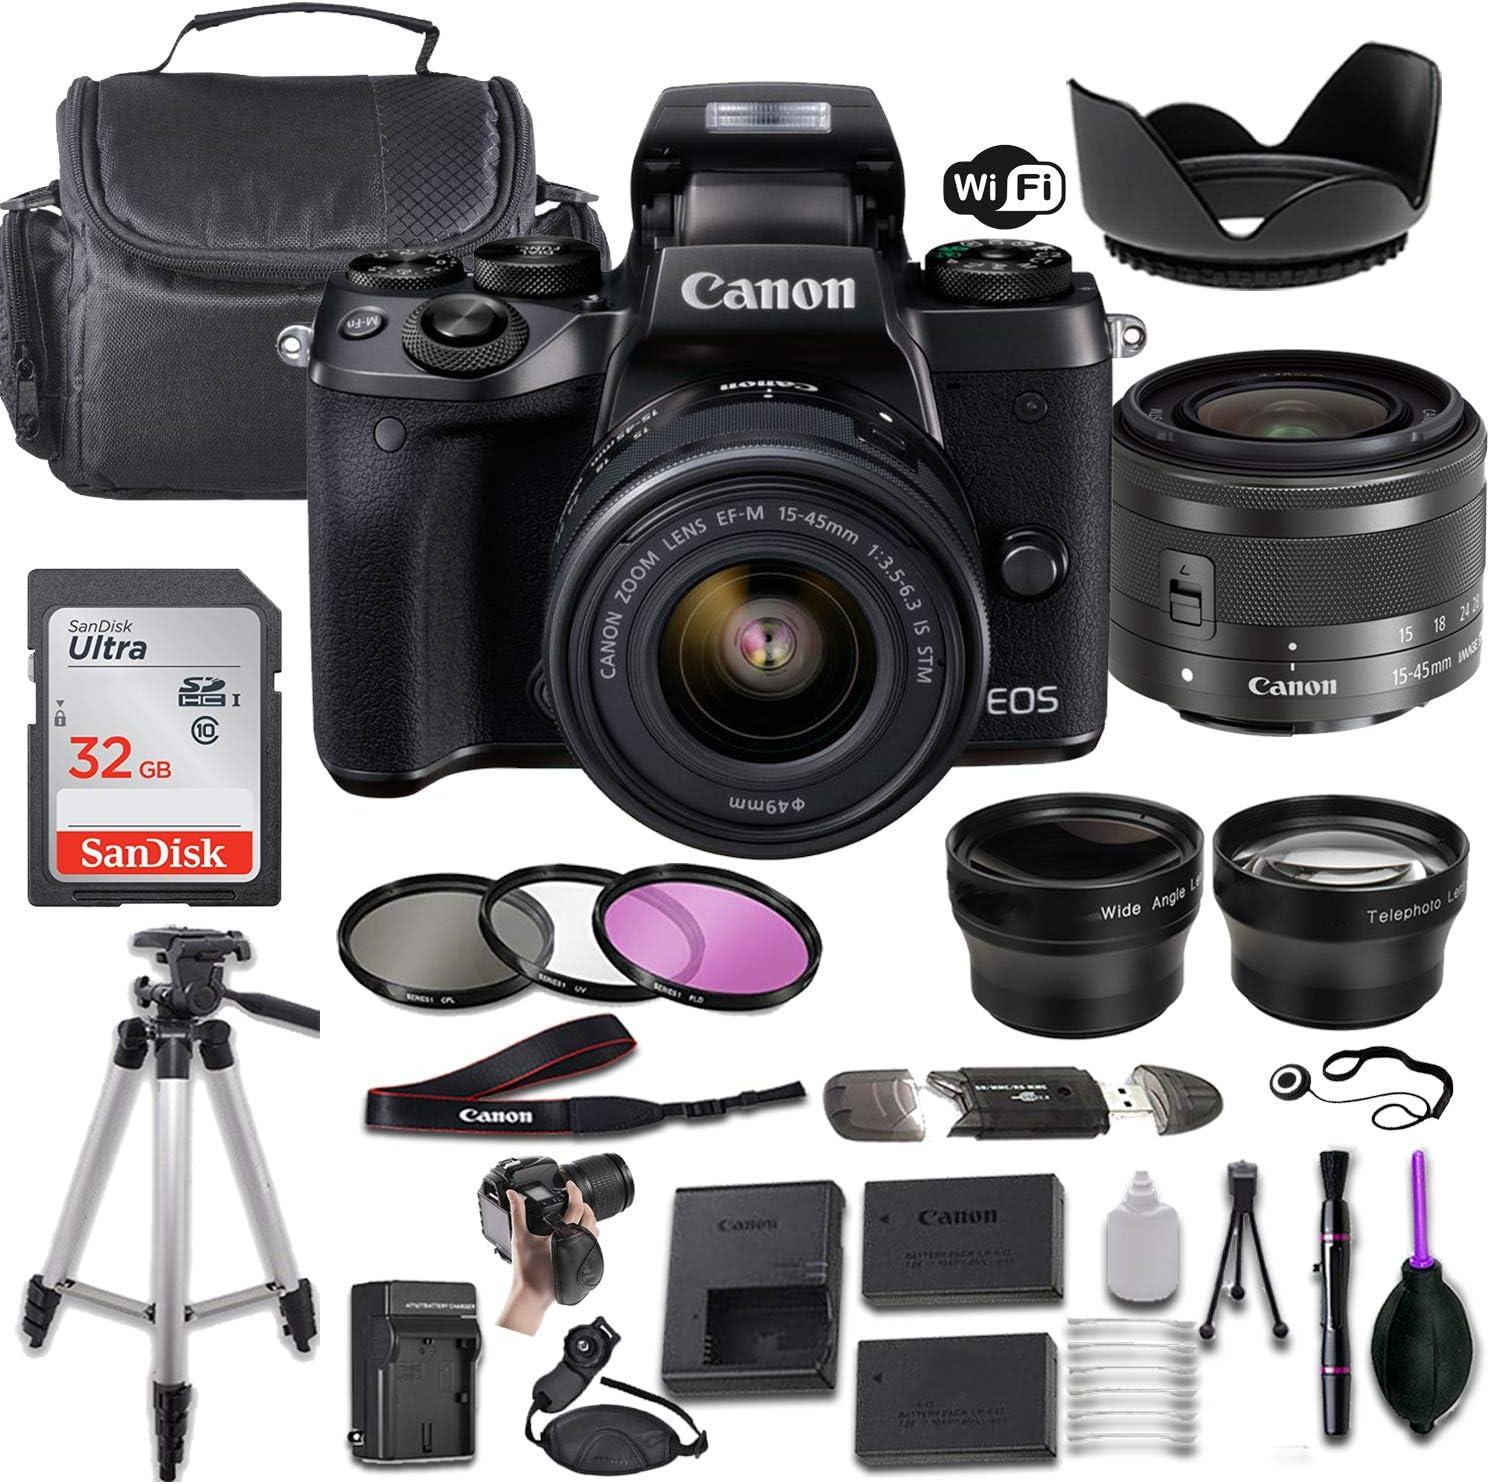 Canon EOS M5 Mirrorless Digital Camera EF-M Luxury 15-45mm Max 52% OFF f 3.5-6.3 w